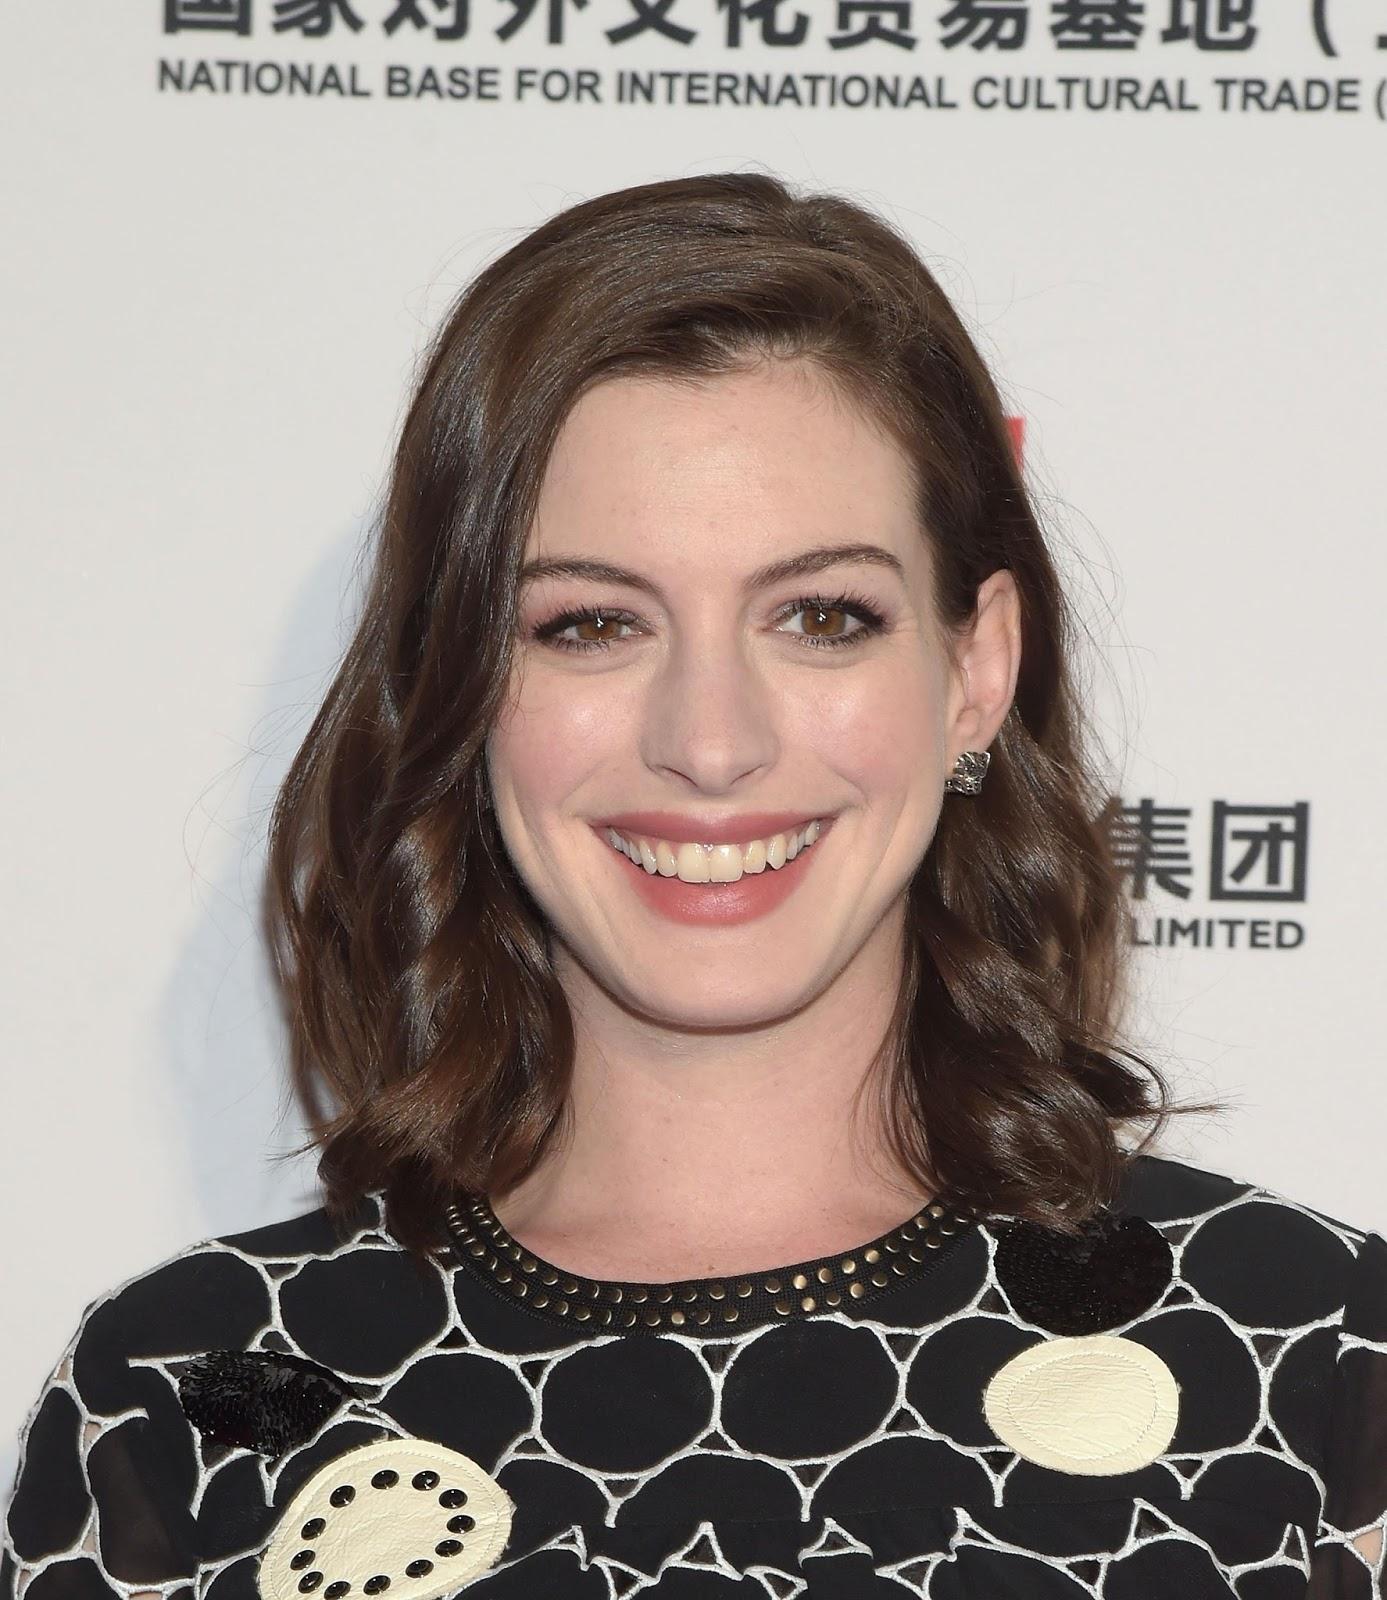 Actress, Singer, @ Anne Hathaway